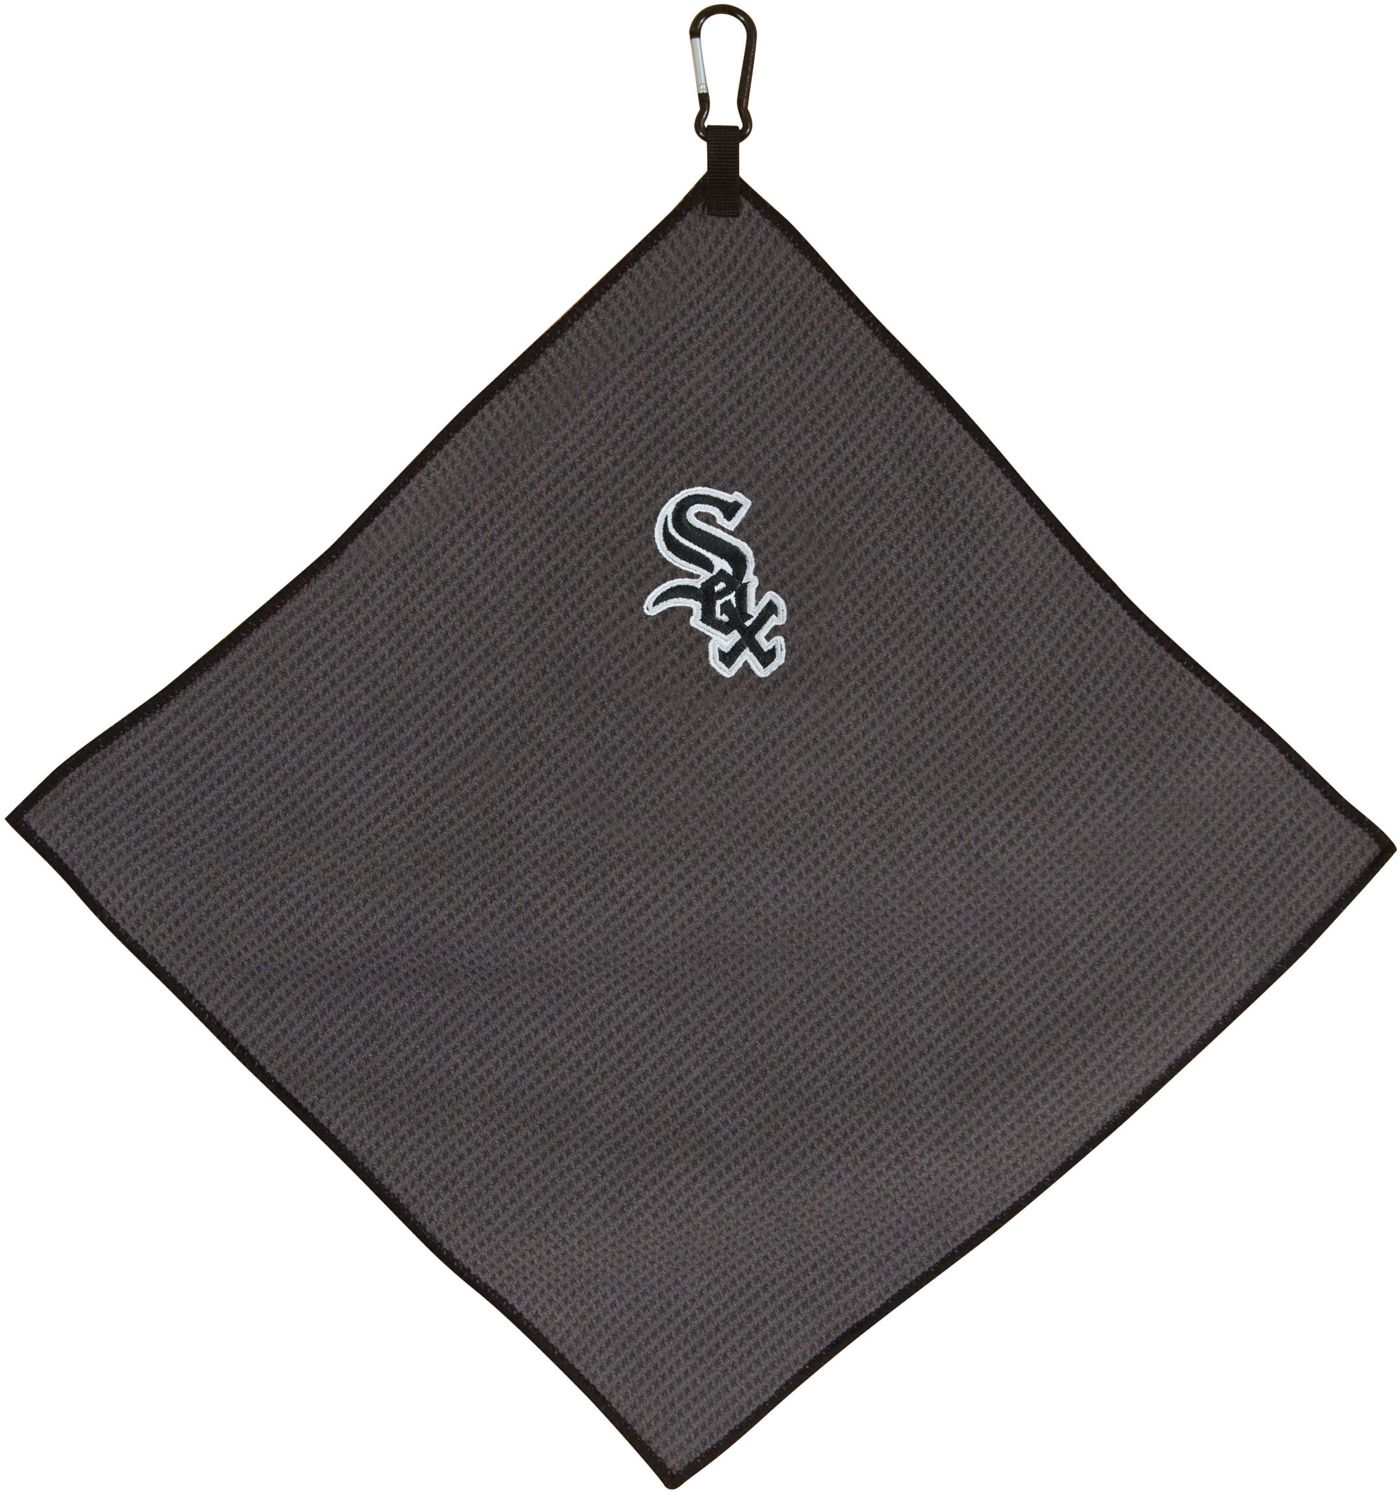 "Team Effort Chicago White Sox 15"" x 15"" Microfiber Golf Towel"